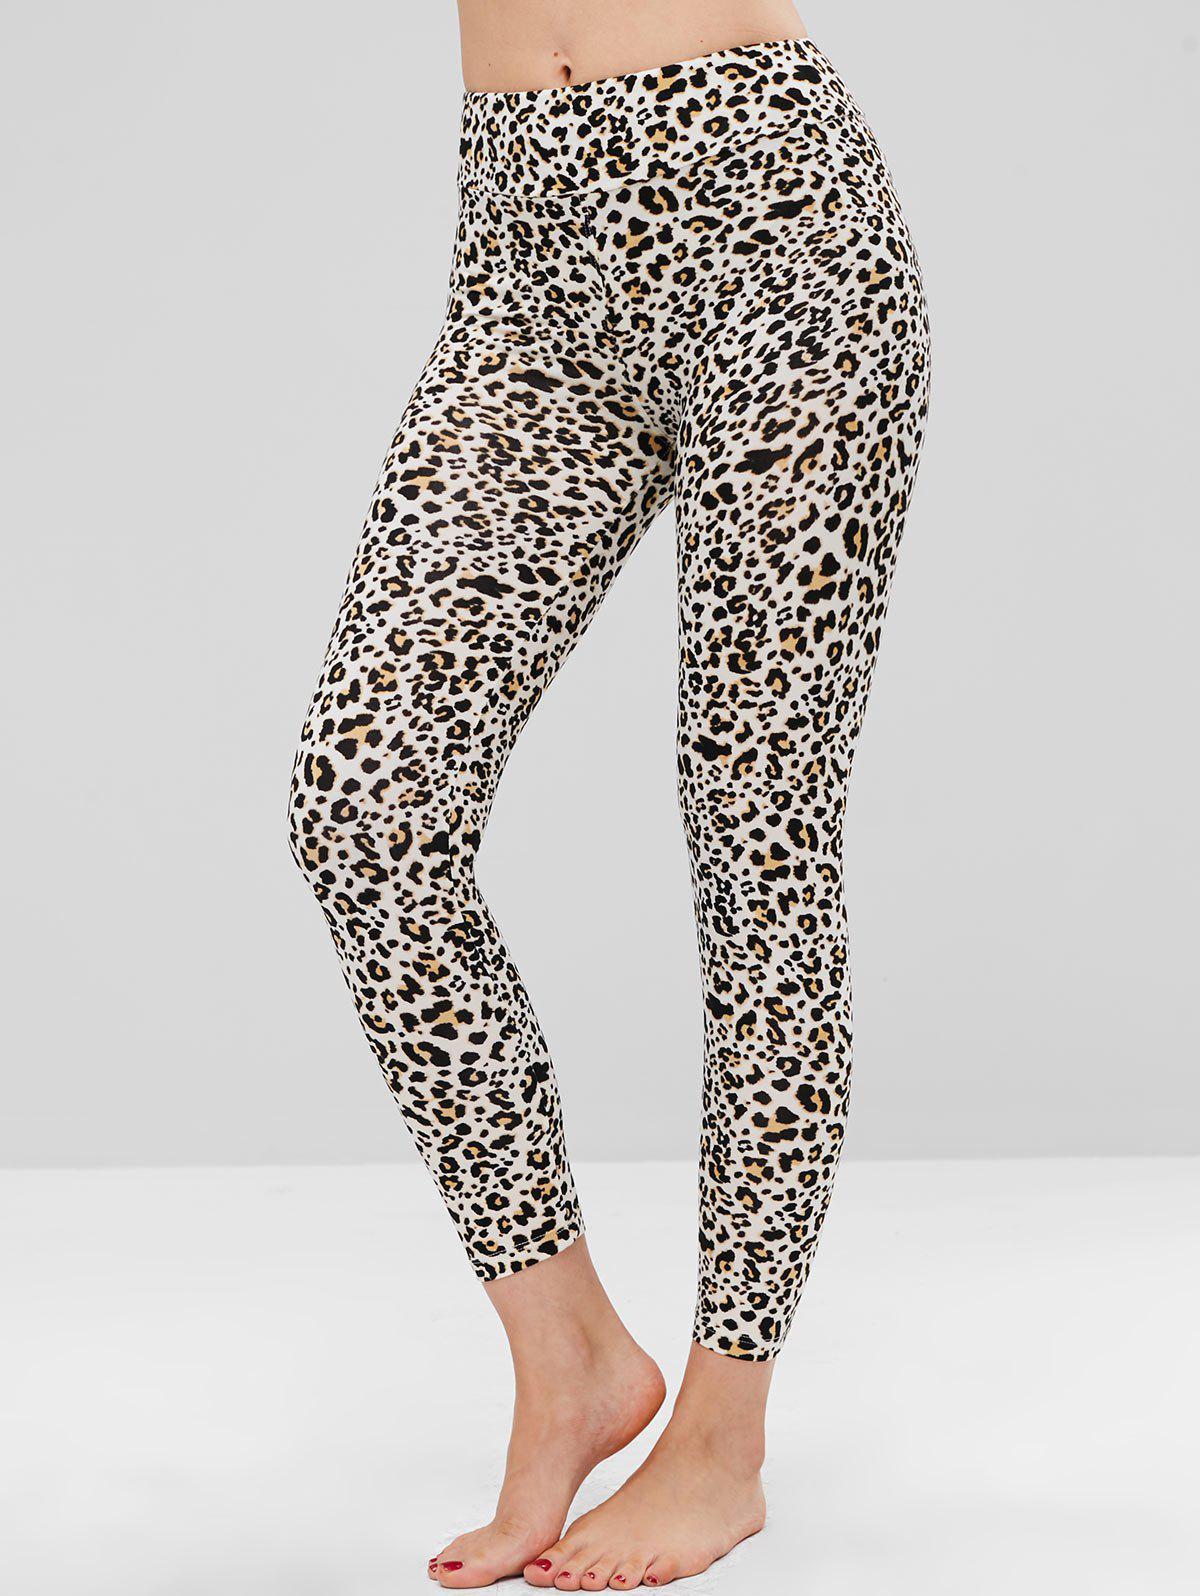 Leopard Print Soft Ankle Leggings